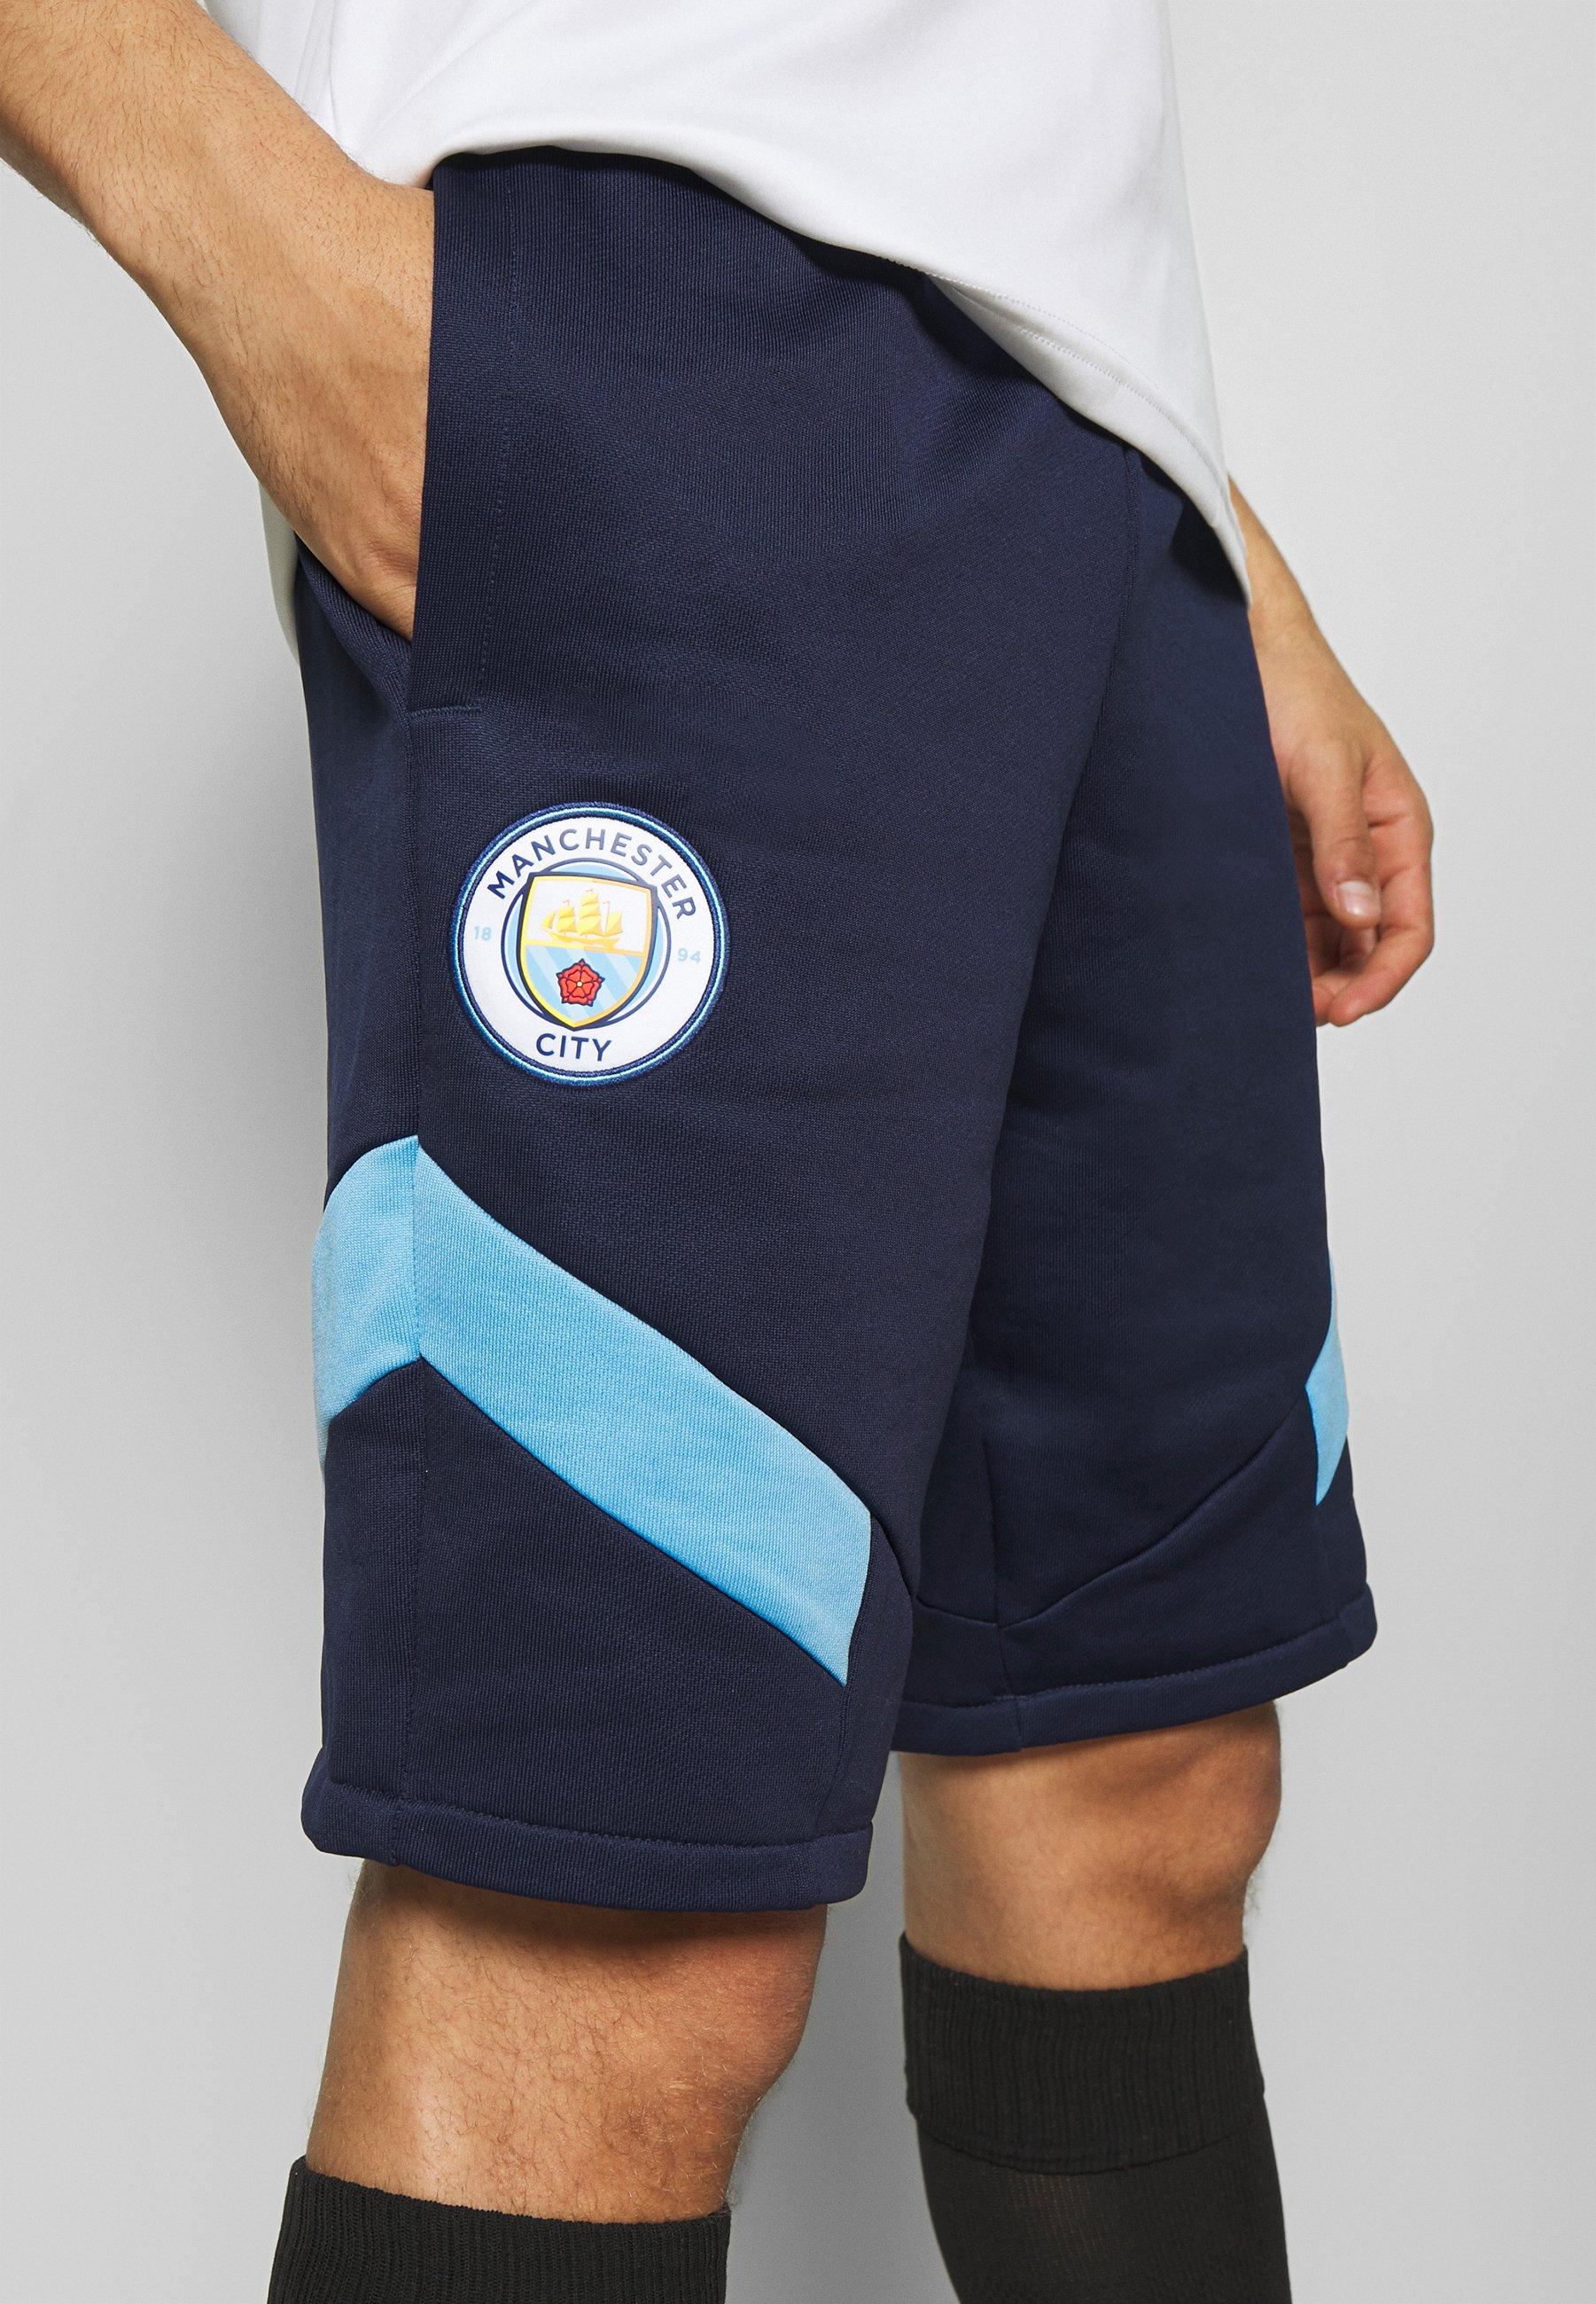 Puma Manchester City Iconic Shorts - Träningsshorts Peacoat/team Light Blue